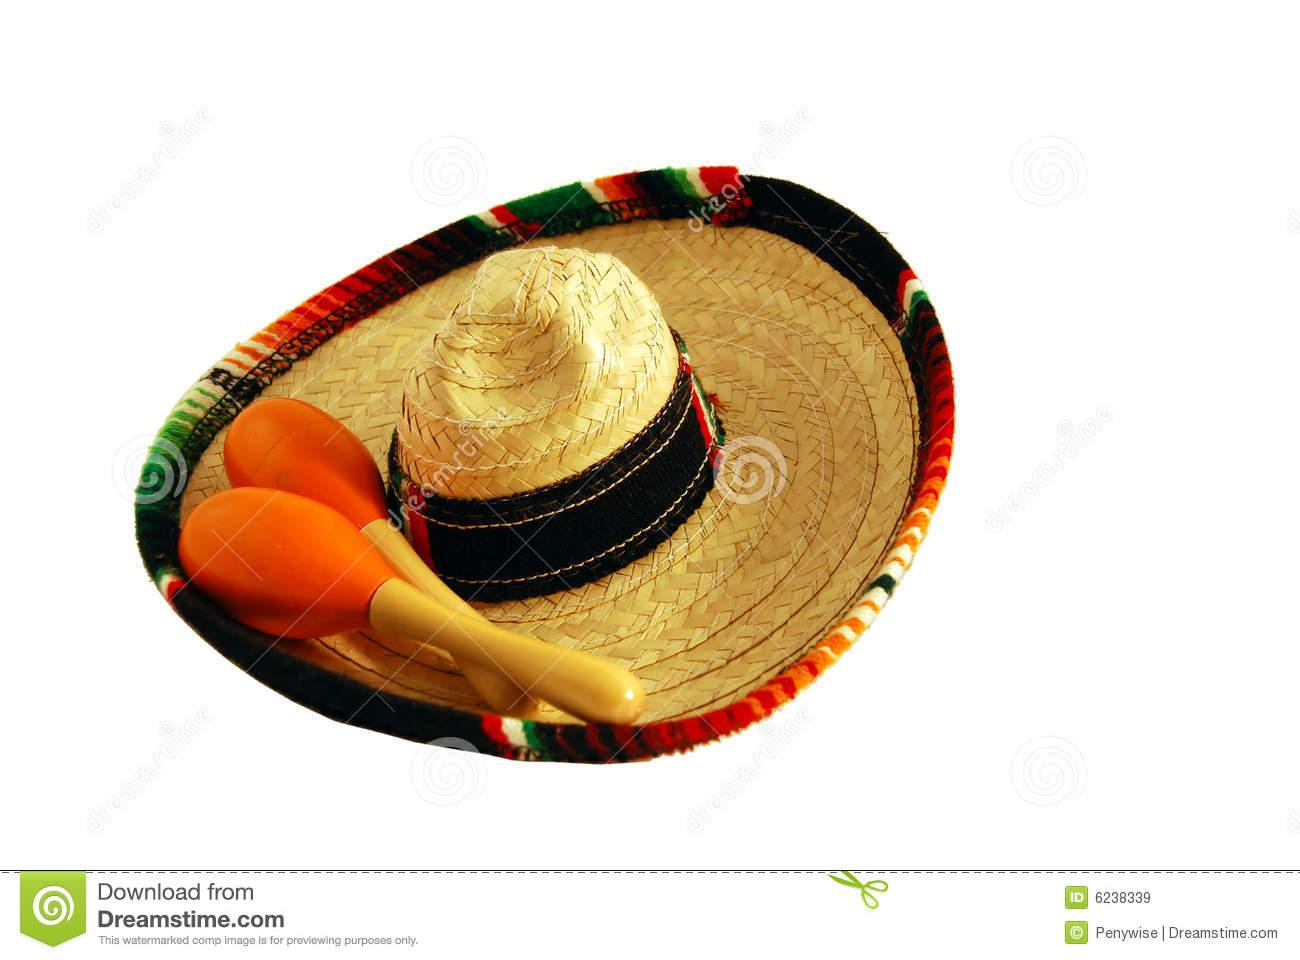 Spanish clipart spanish maraca For Free Images Maracas clipart